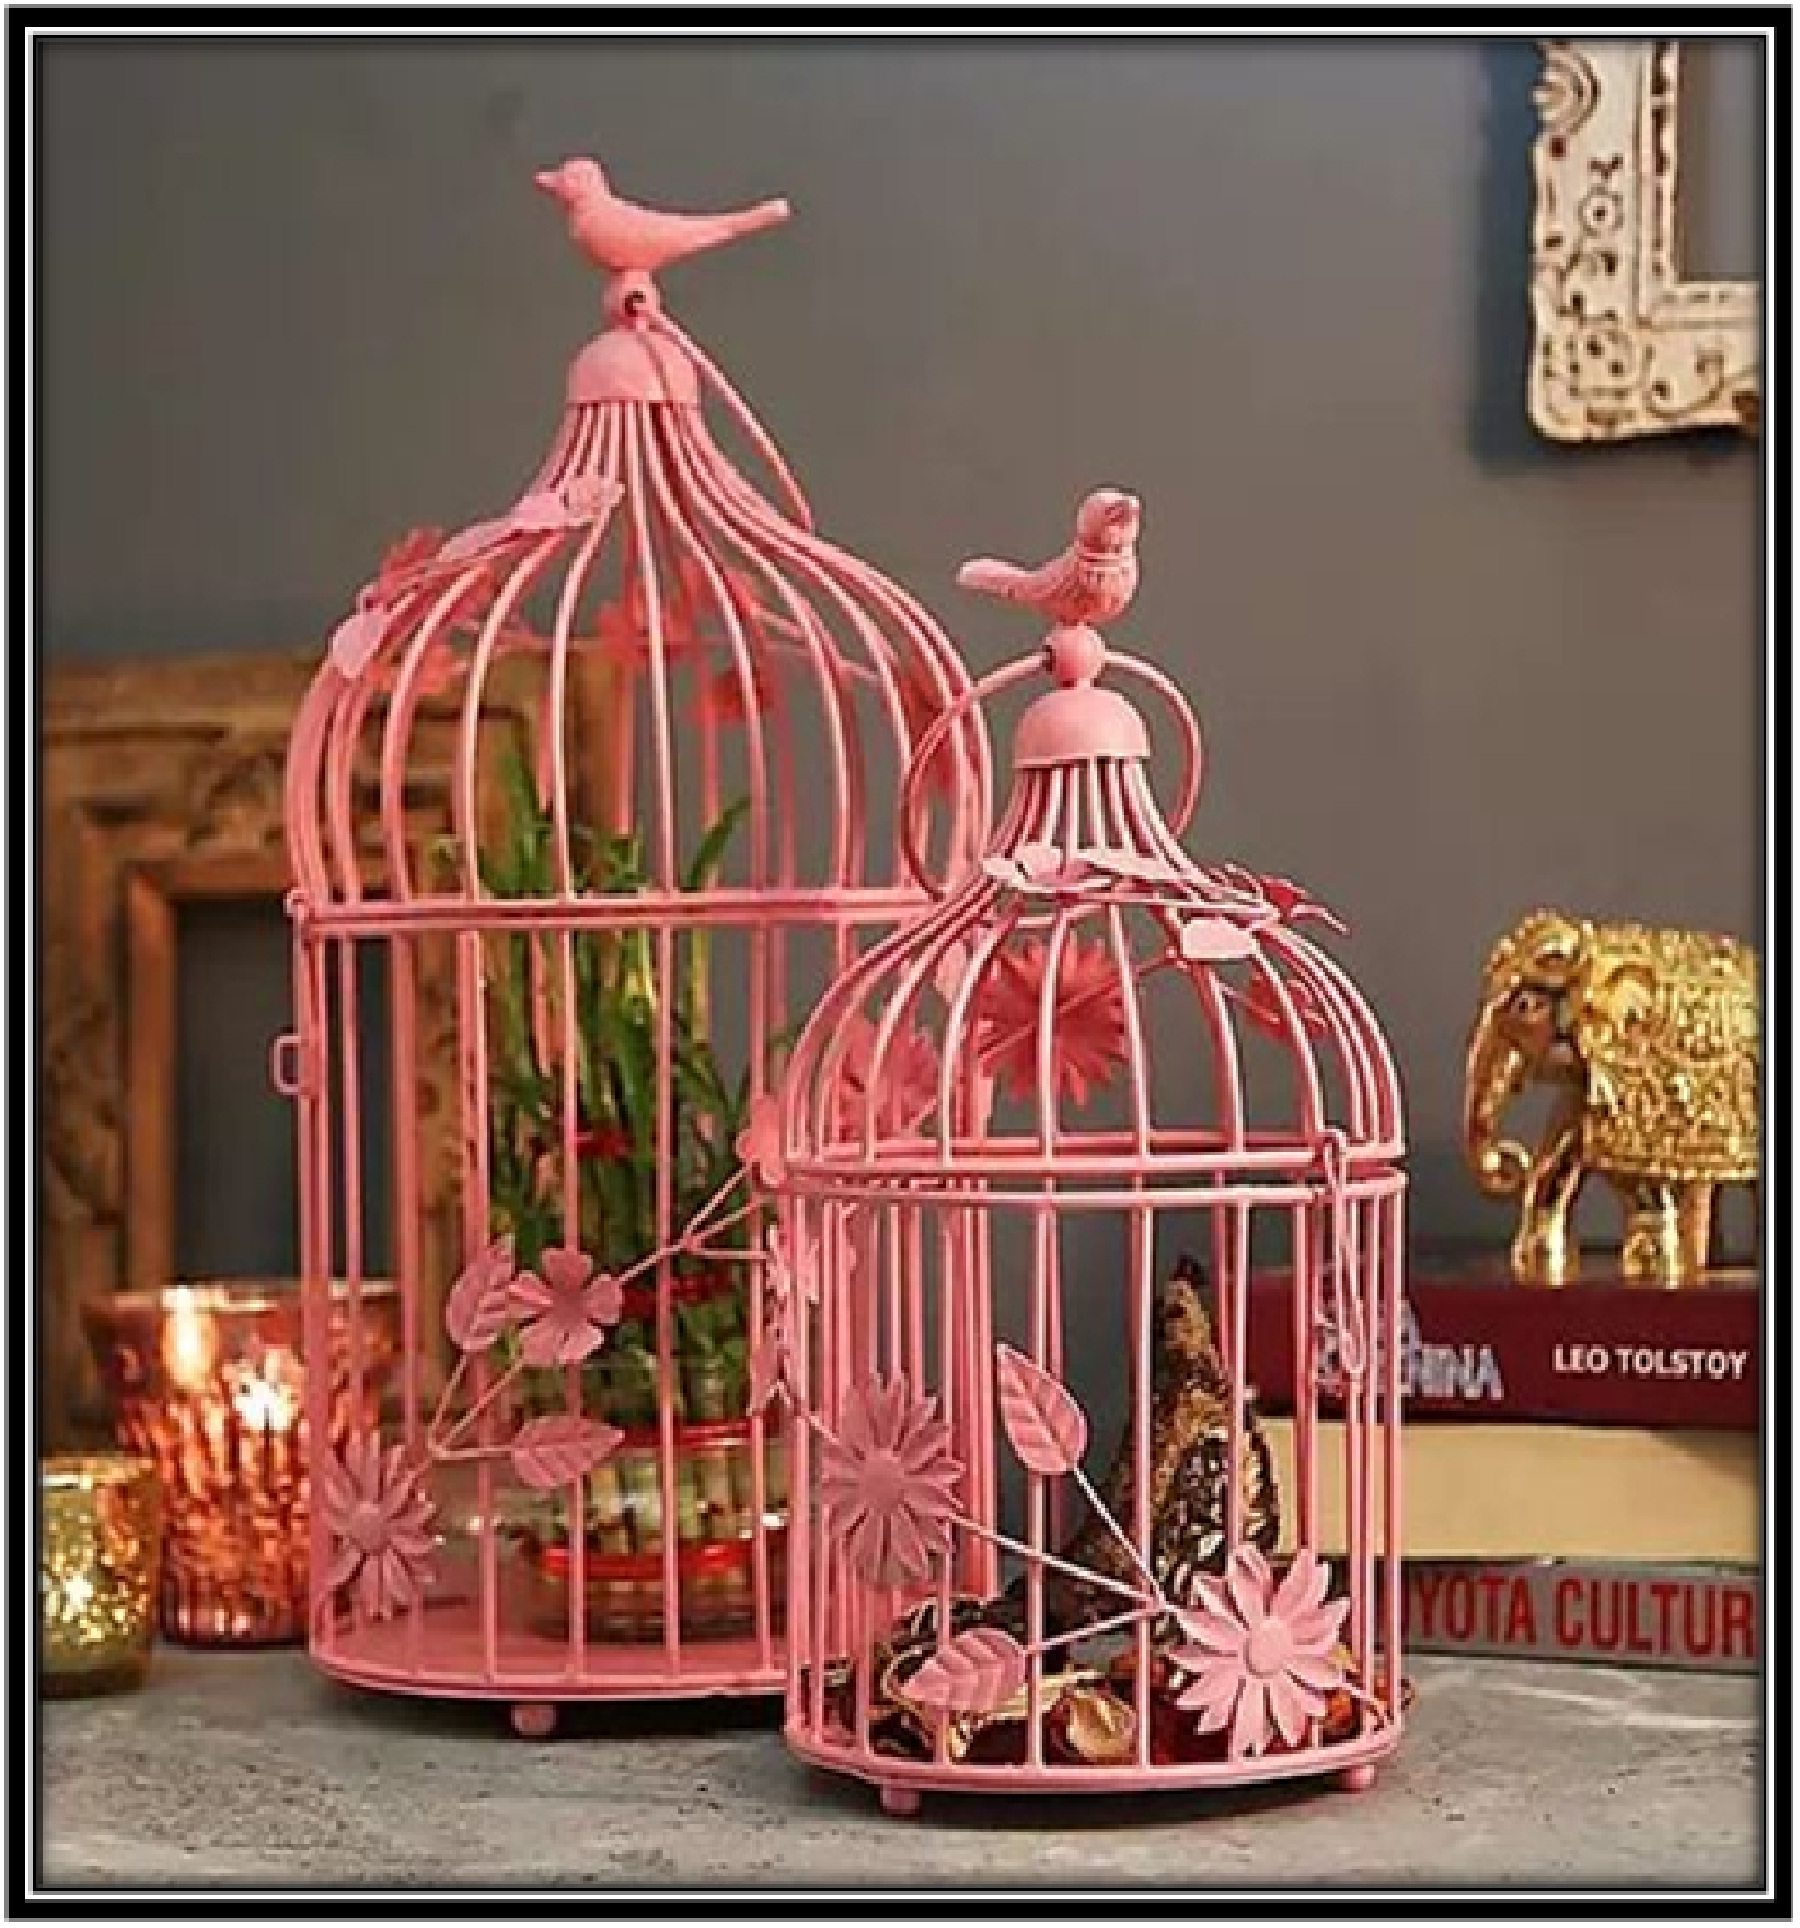 home ware items for your dream home - home decor ideas